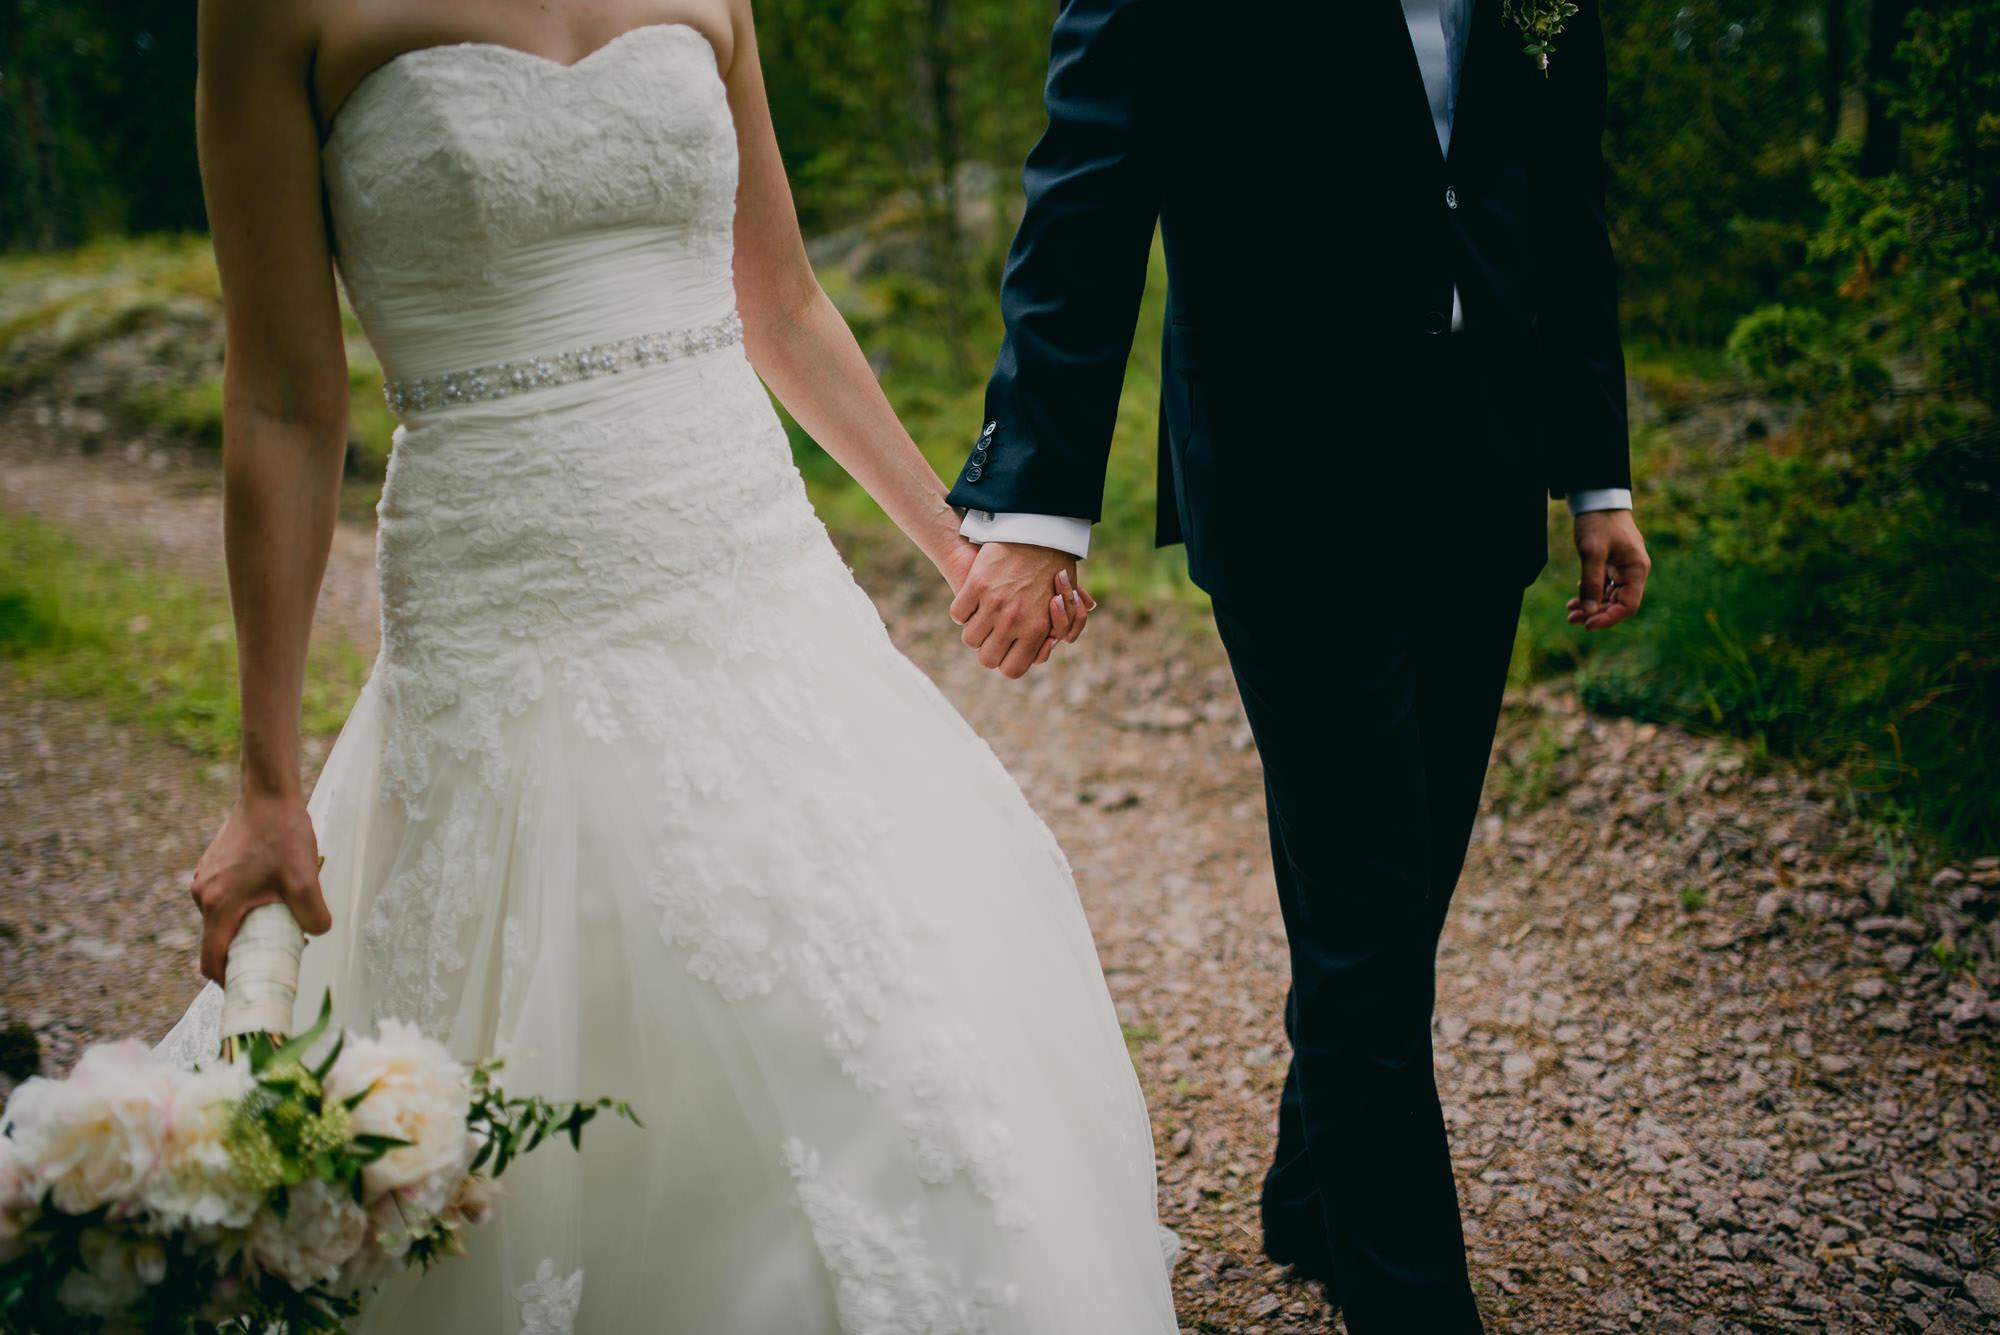 rabbit_visuals_haavideo_wedding_videography_el-016.jpg